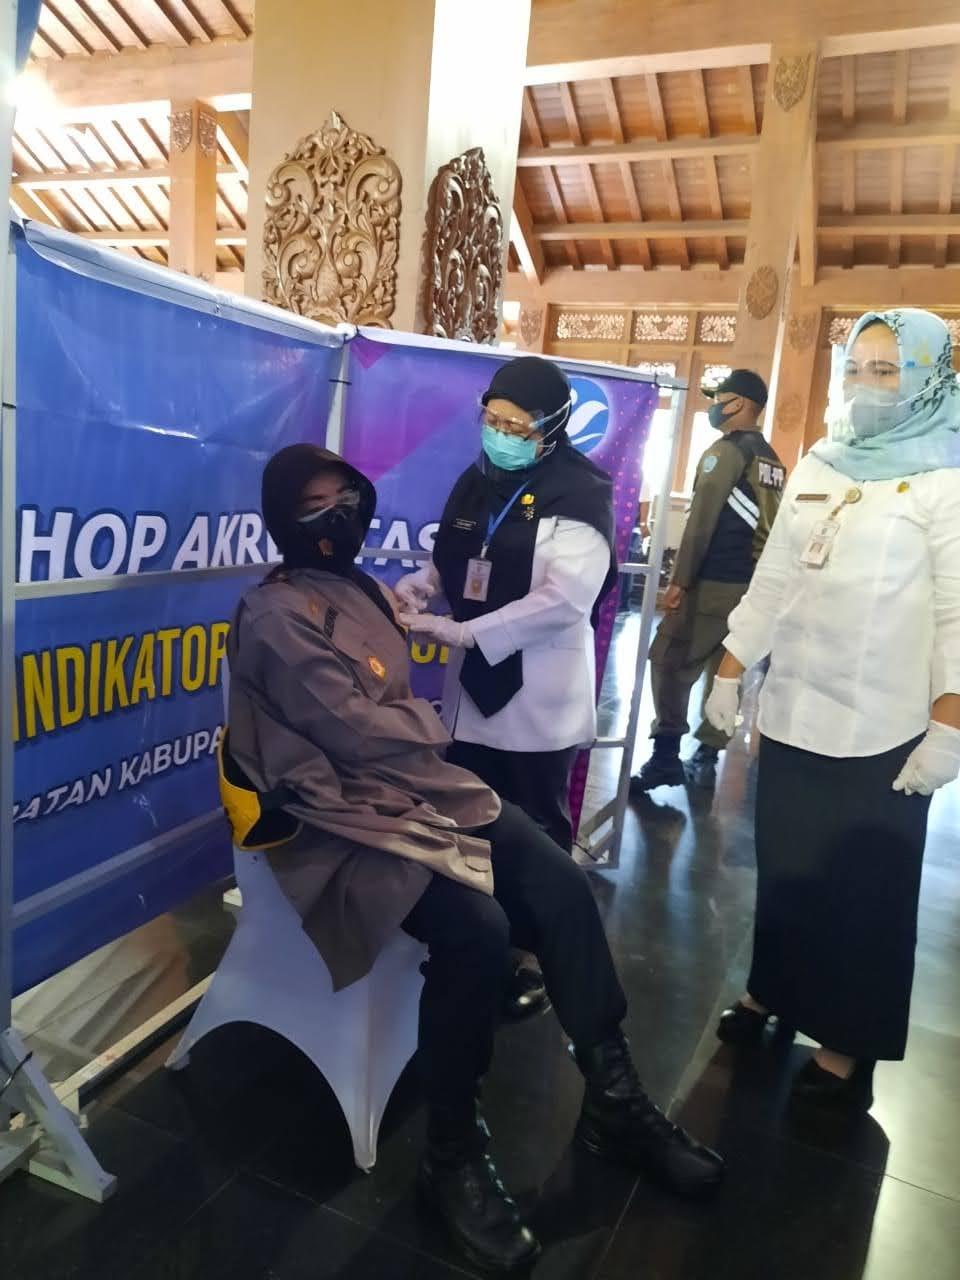 Wakapolres Ponorogo Bersama Perwakilan Forpimda Terima Suntikan Vaksinasi